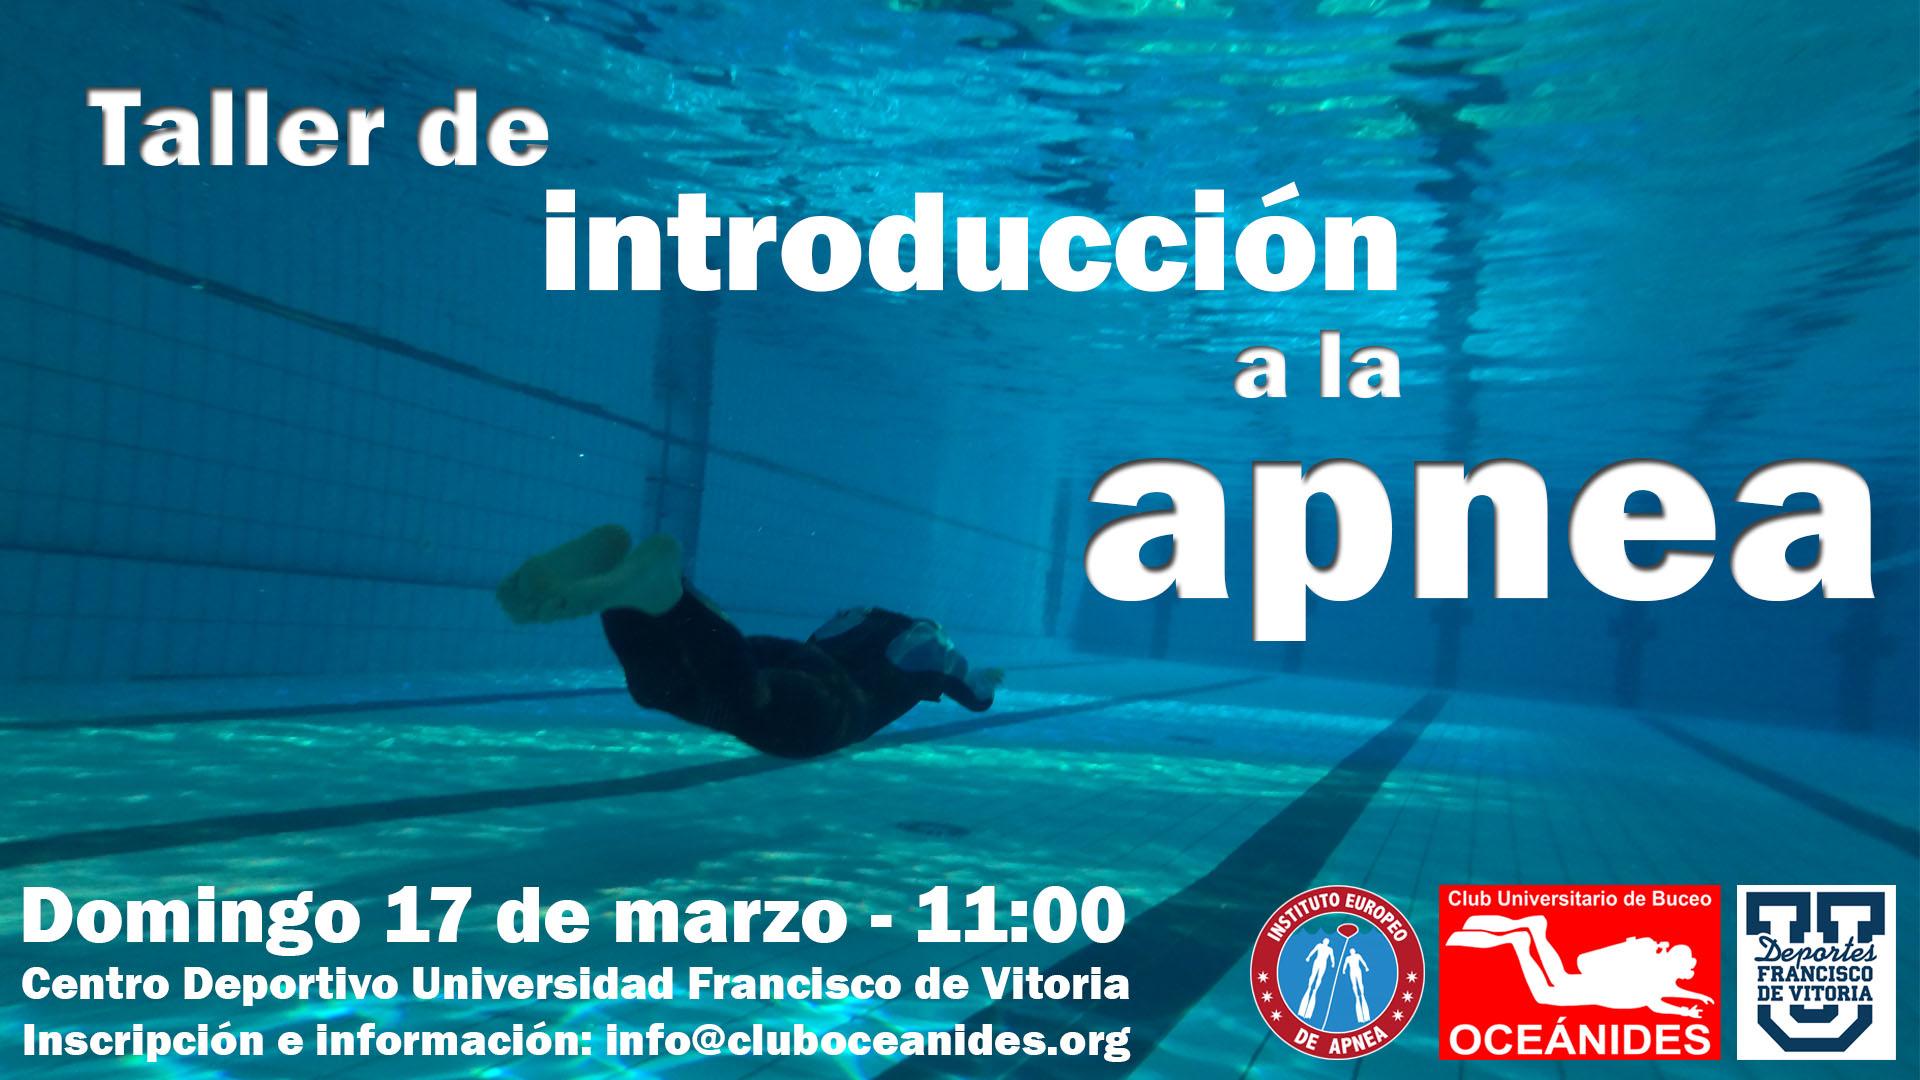 taller apnea Taller de buceo en la UFV   17 de marzo